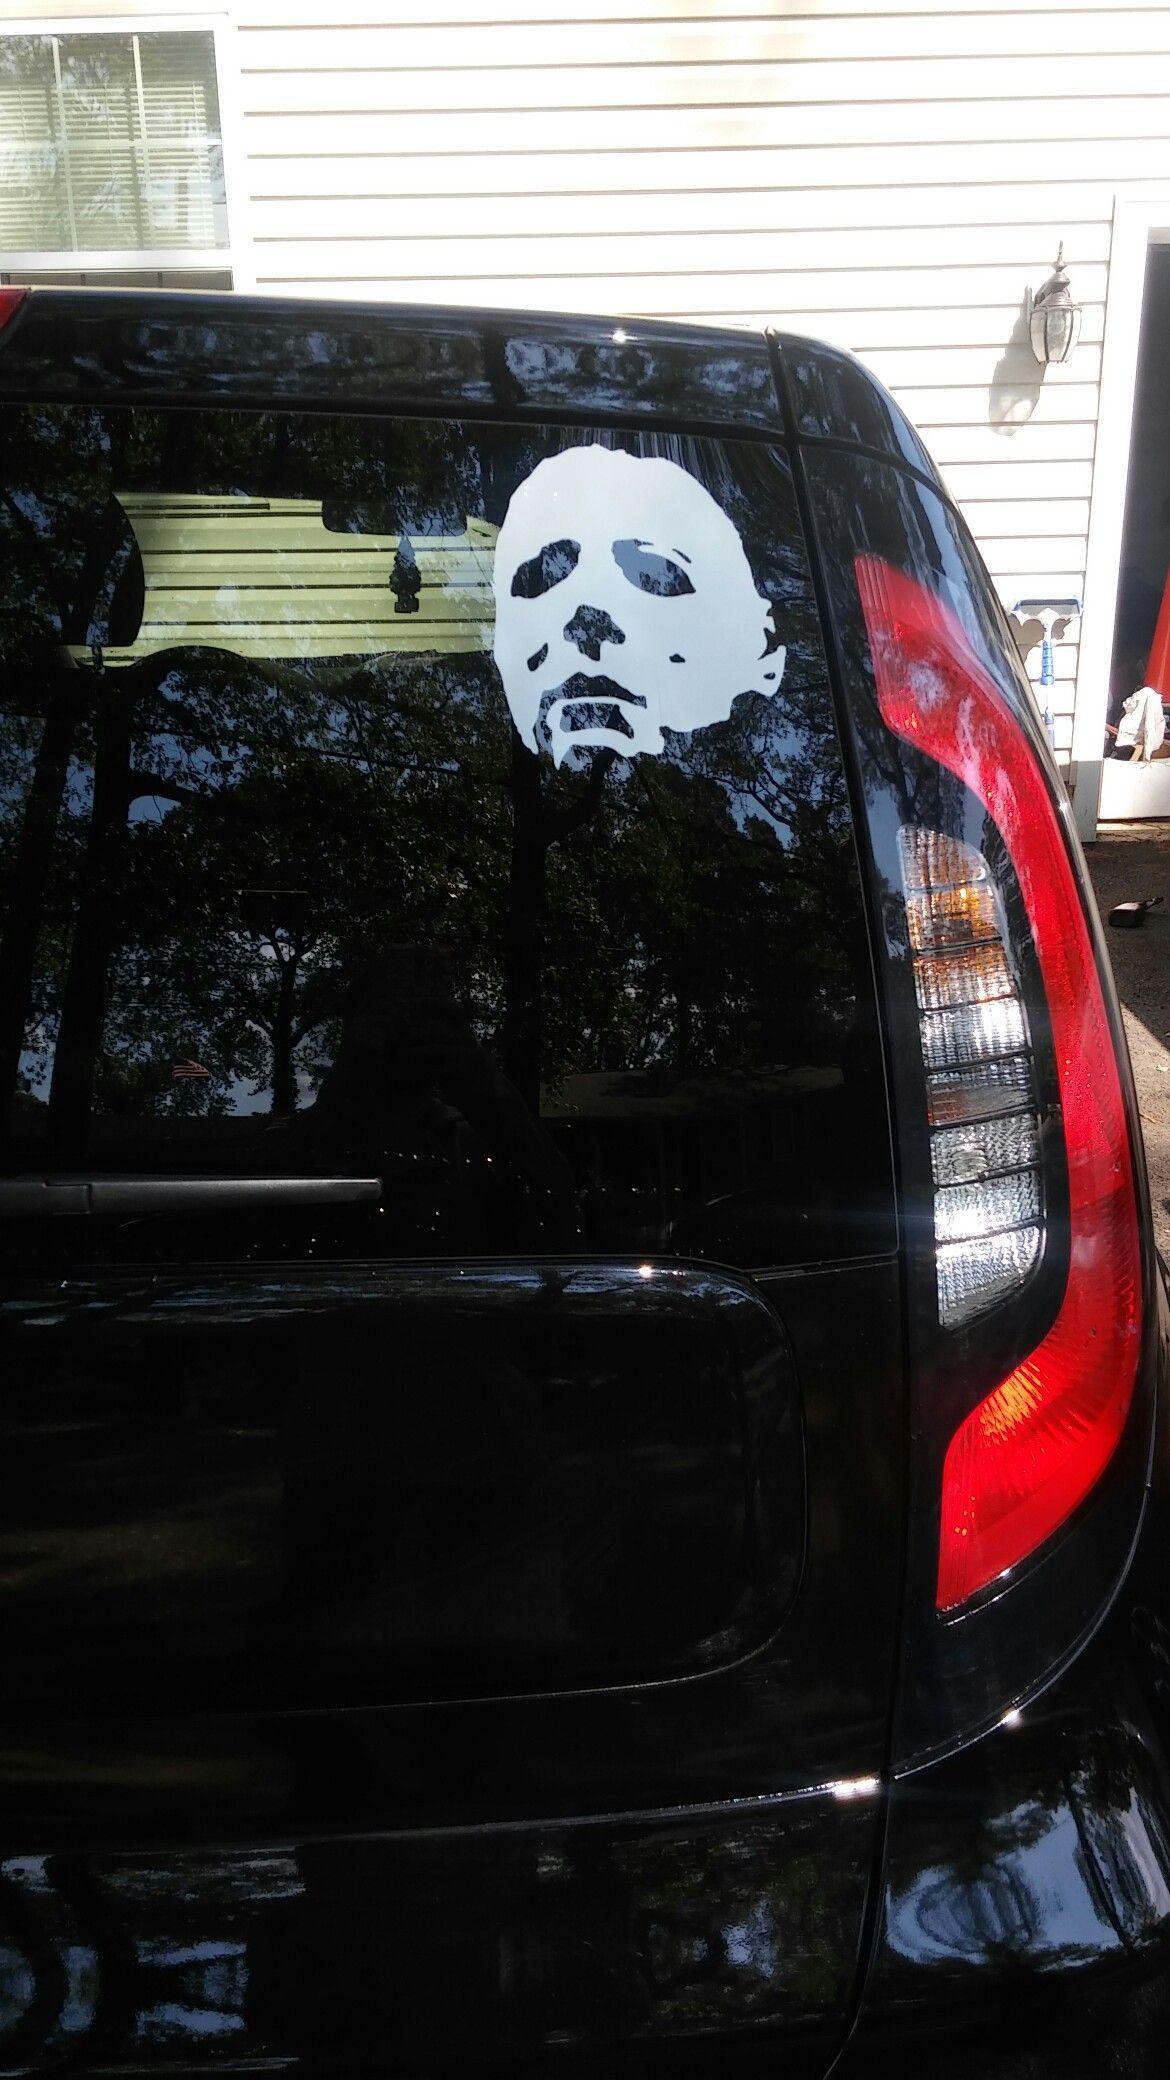 Our Car Sticker Car Car Stickers Darth Vader [ 2080 x 1170 Pixel ]